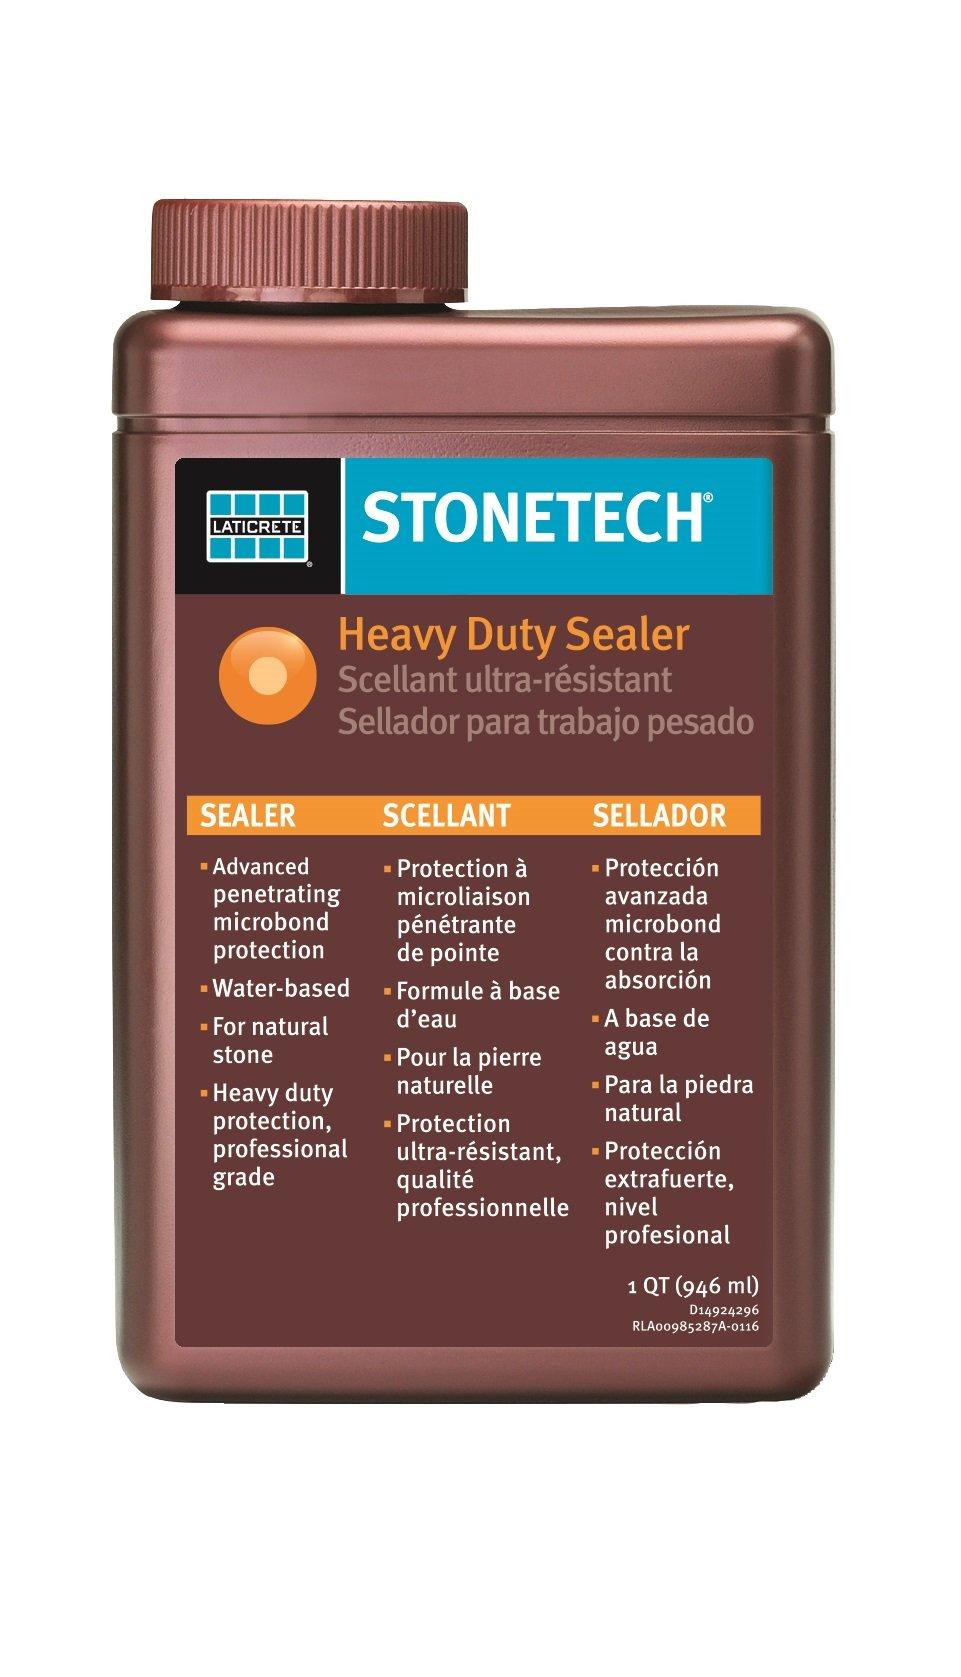 StoneTech Heavy Duty Sealer for Natural Stone, 1-Quart (.946L)